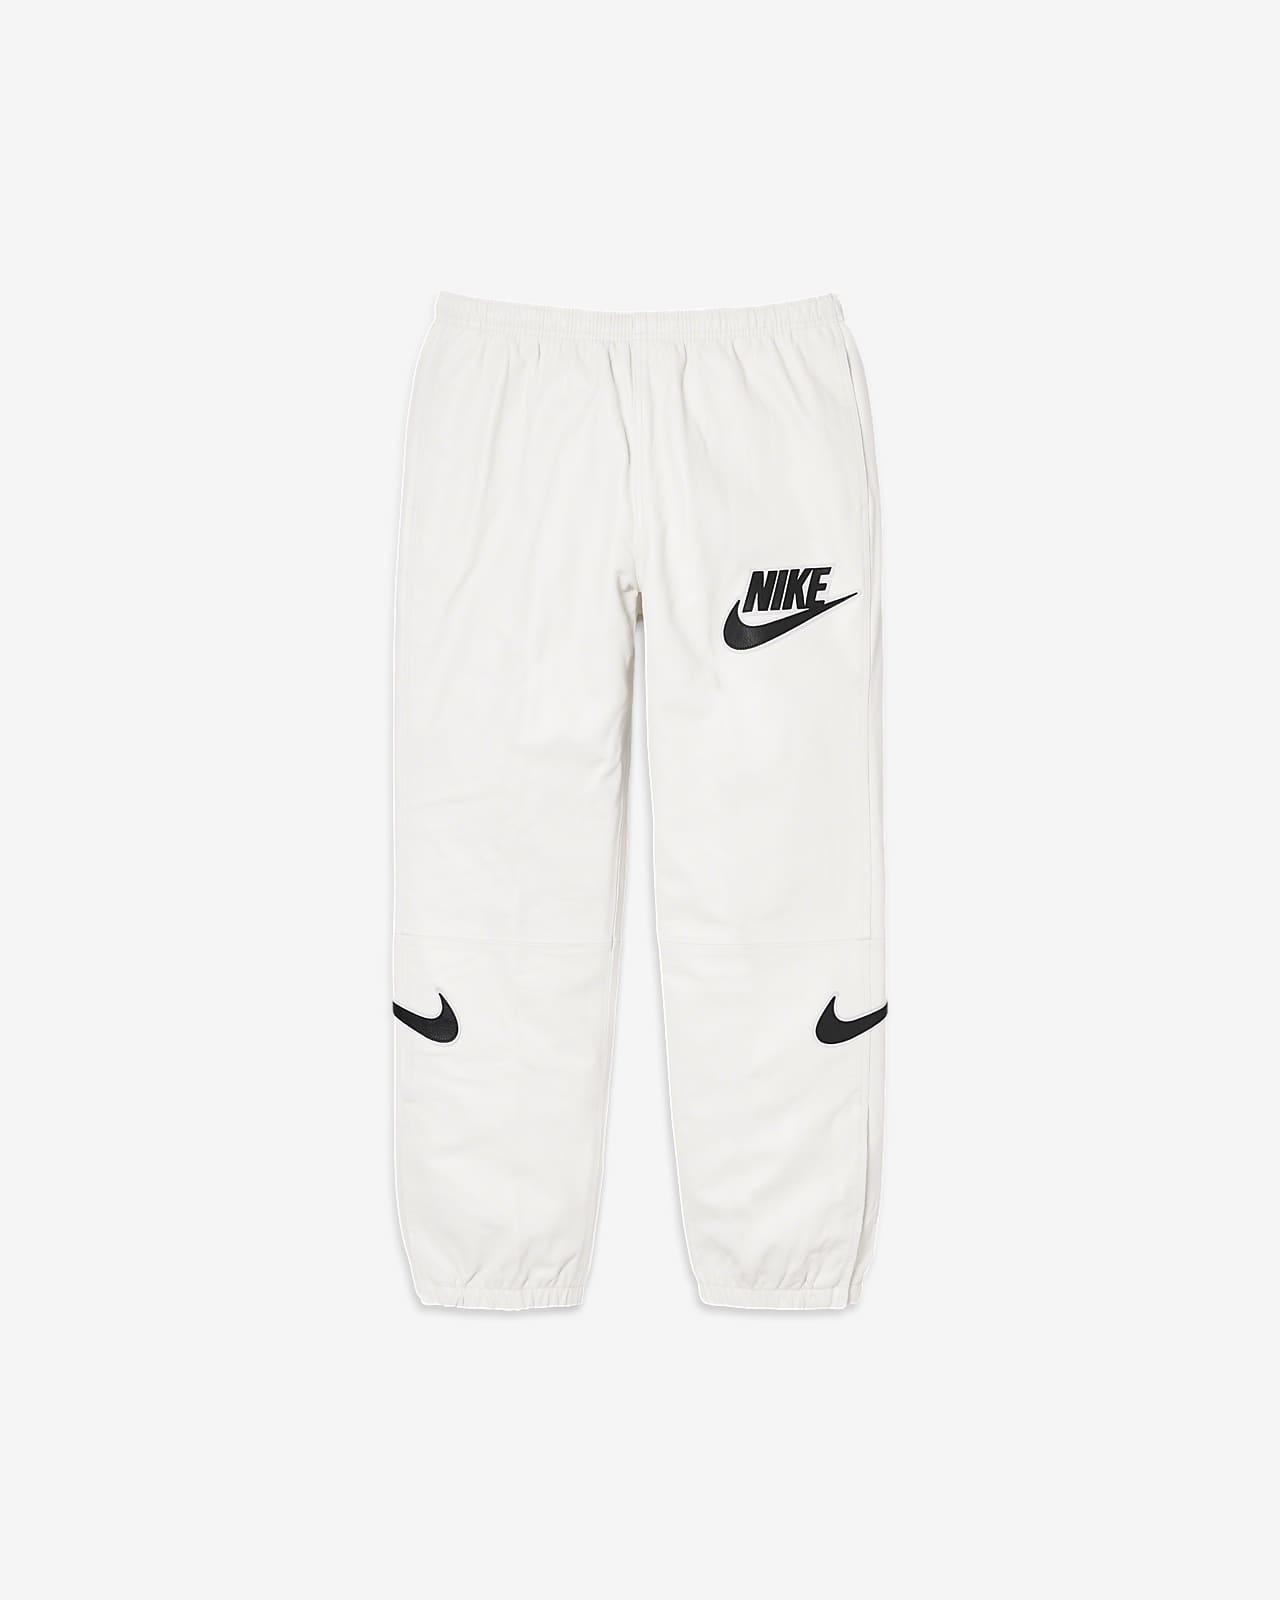 Nike x Supreme Men's Leather Pants